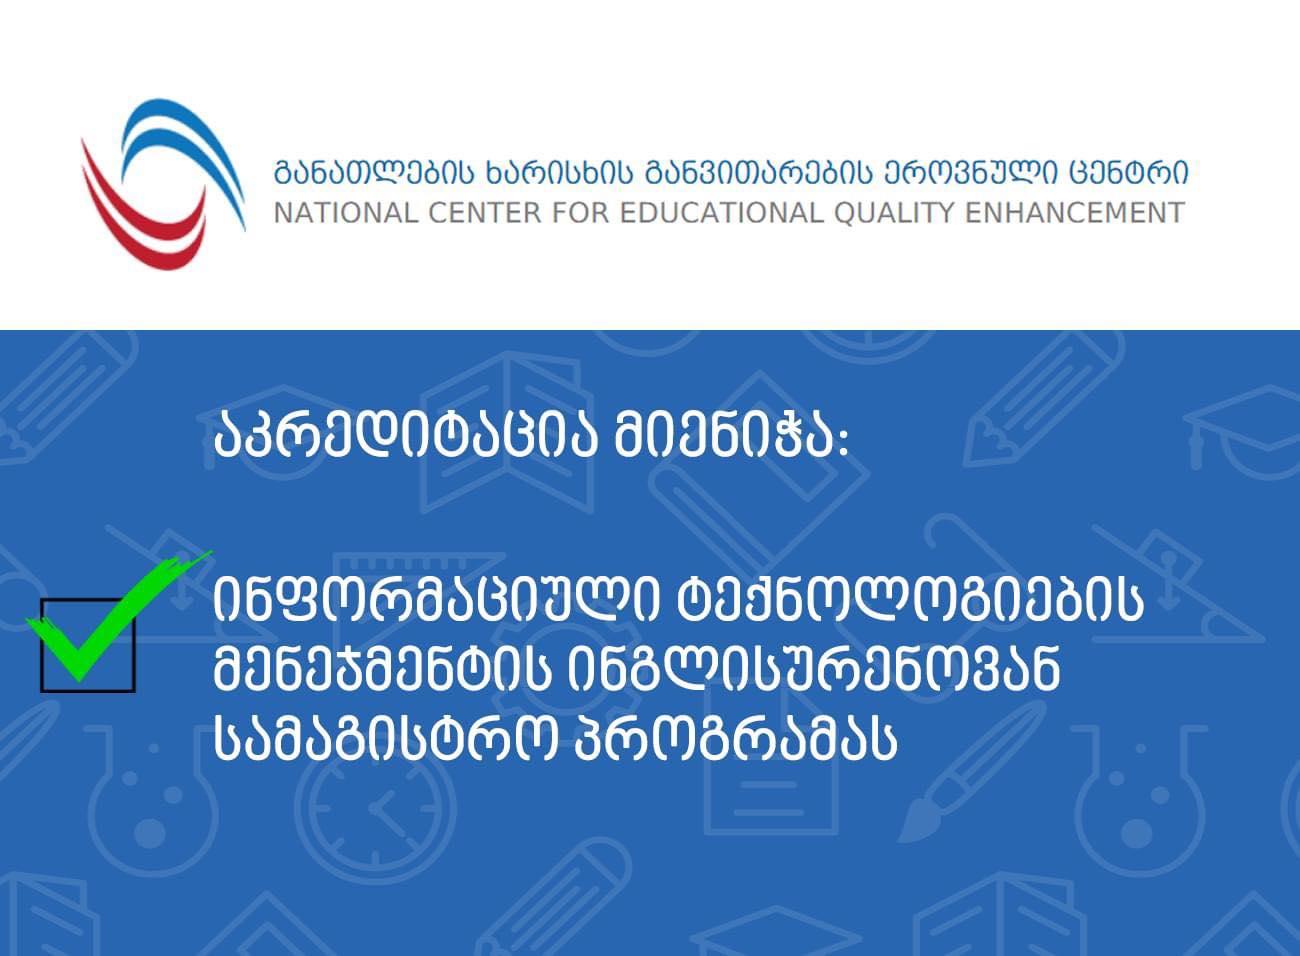 CST-ის ინგლისურენოვანი სამაგისტრო საგანმანათლებლო პროგრამის აკრედიტაცია